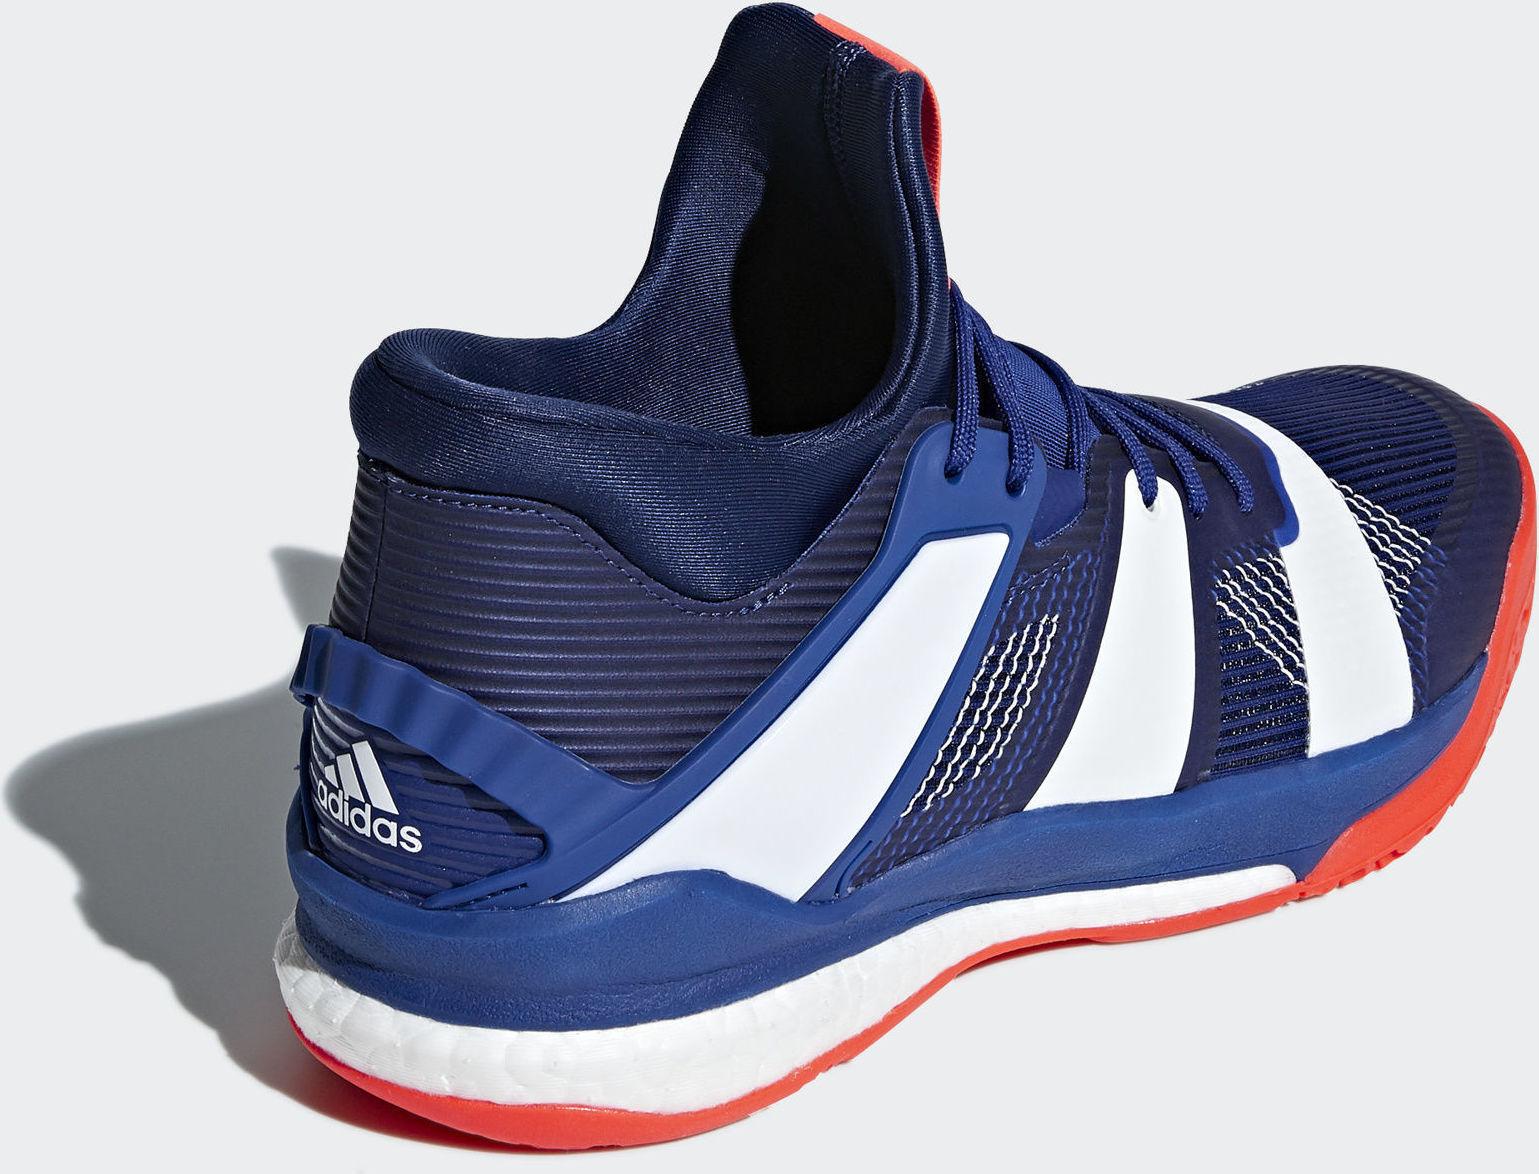 size 40 a833d c1e46 Adidas Stabil X Mid CP9385